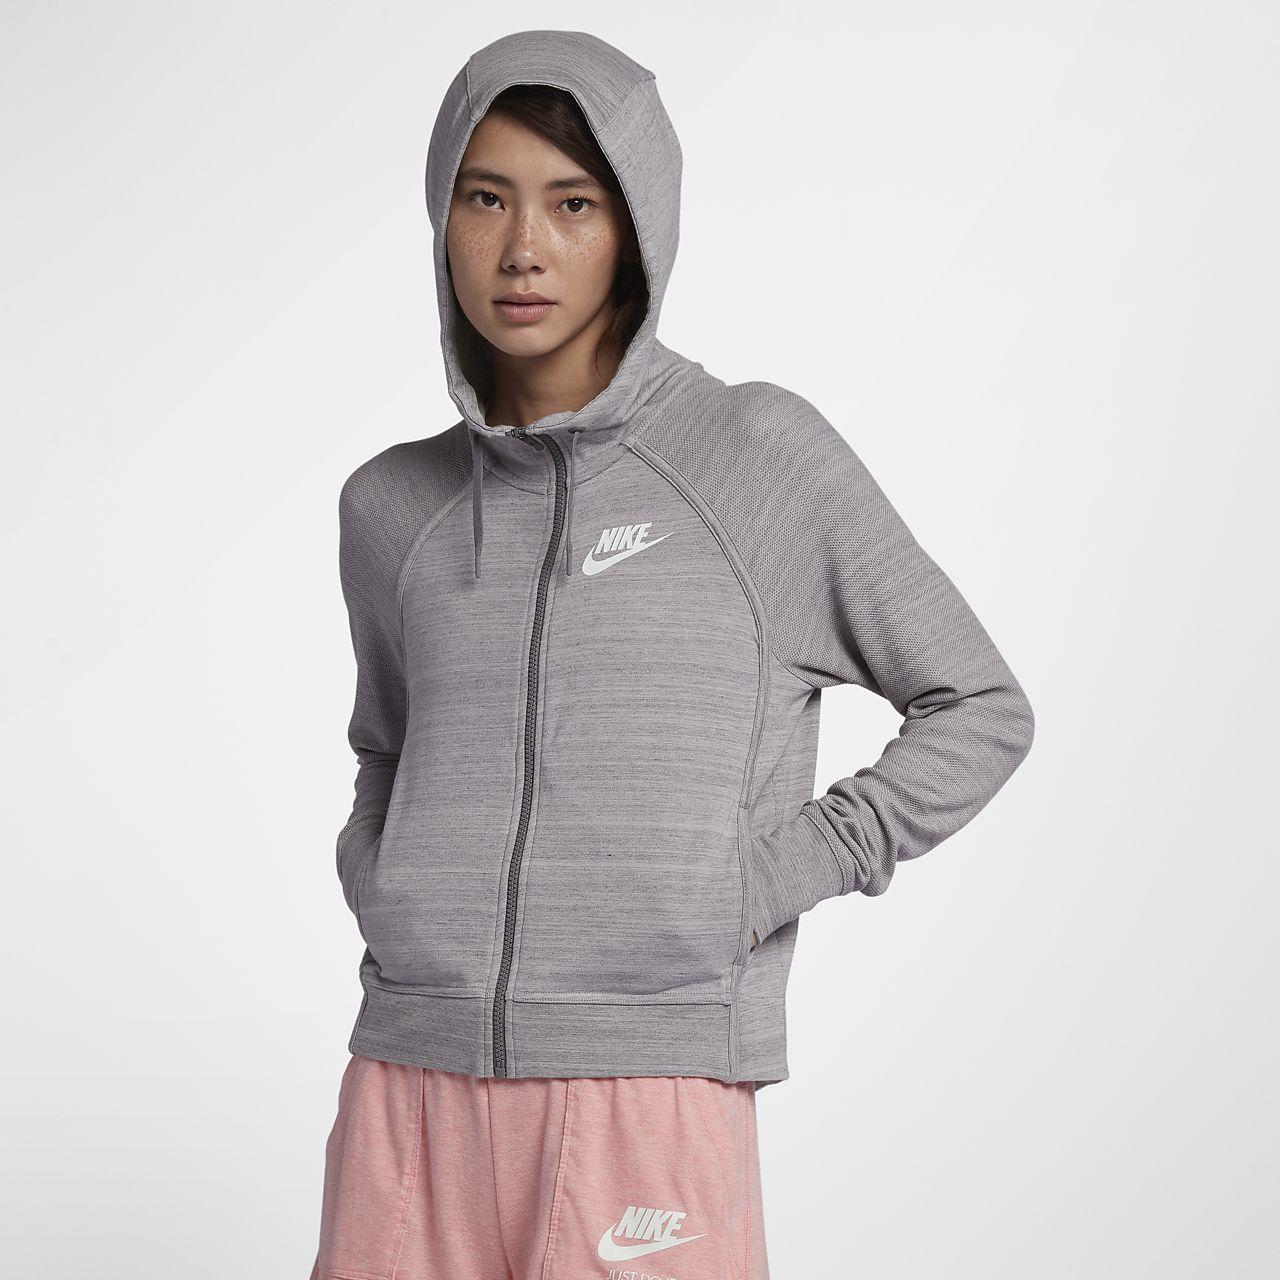 38c1bb87a7e69 Nike Sportswear Advance 15 Women s Knit Jacket. Nike.com EG